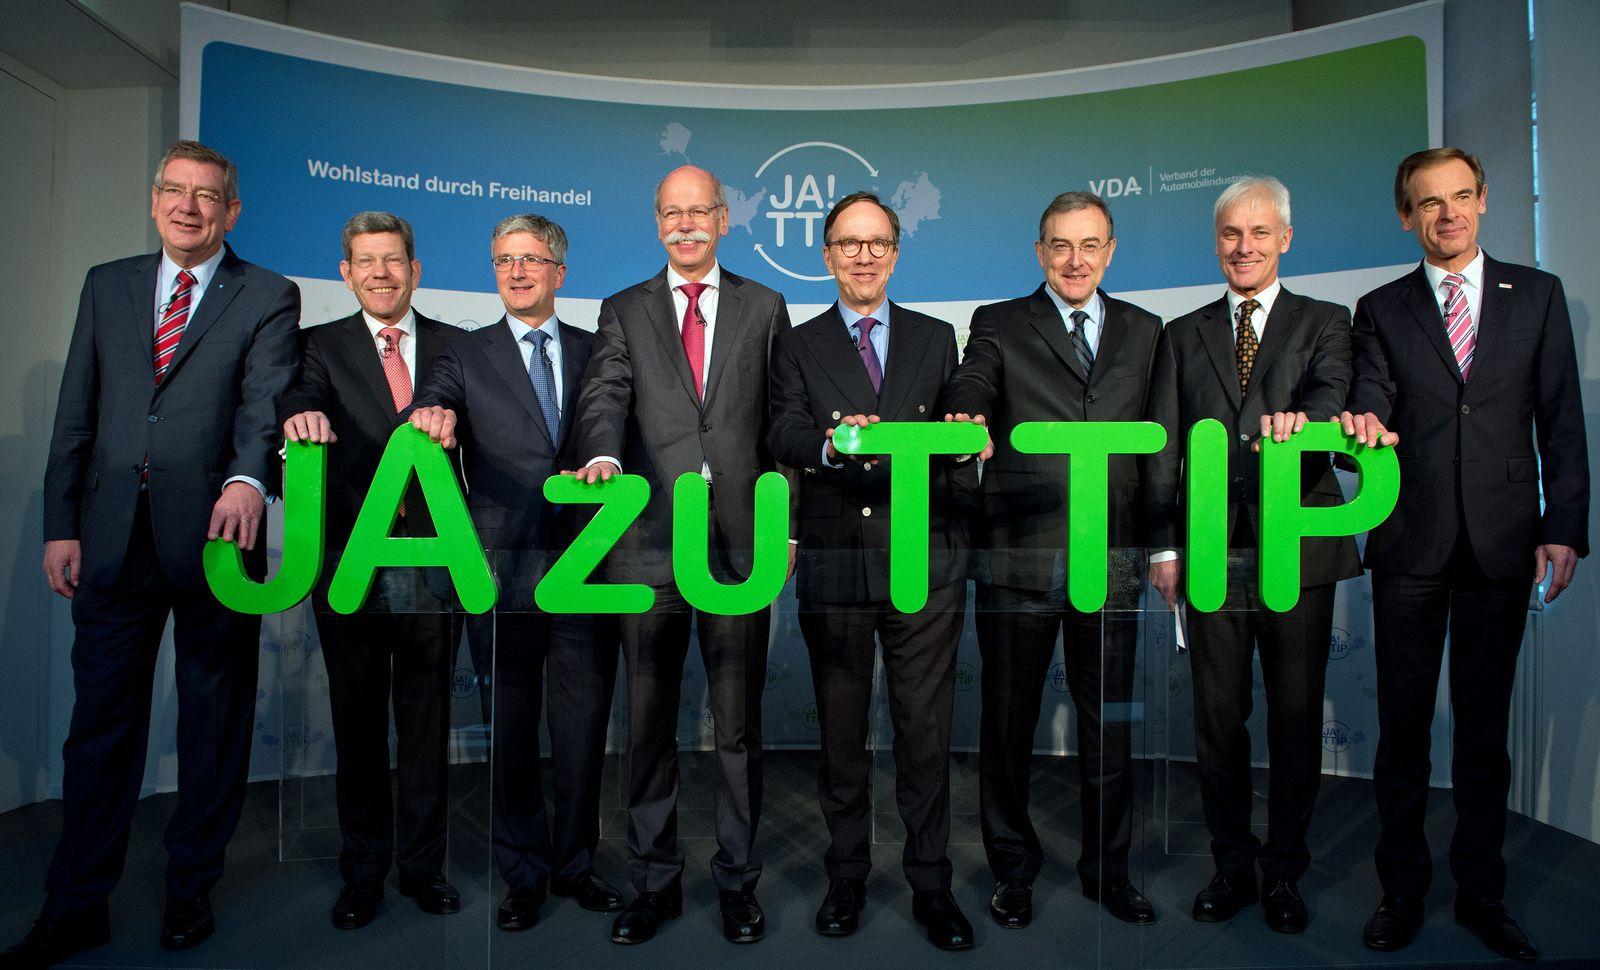 VDA / Wissmann / Zetsche / Reithofer / Stadler / TTIP